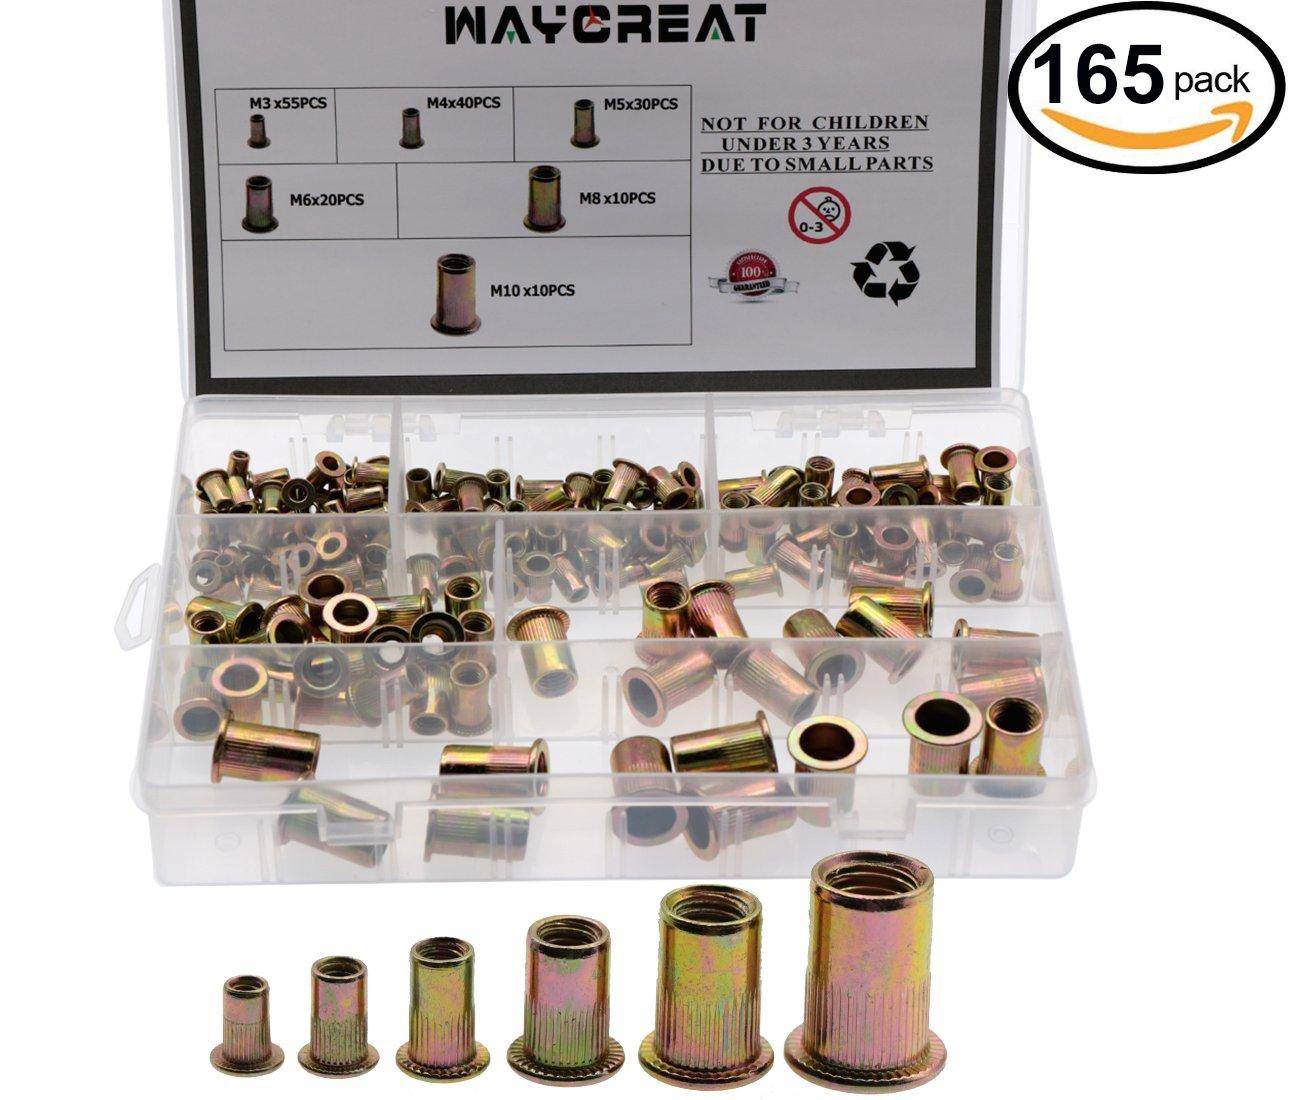 Rivet Nut Kit, Waykino Zinc Plated Carbon Steel Rivet Nuts Threaded Insert Kit Nutsert M3 M4 M5 M6 M8 M10 Pack of 165